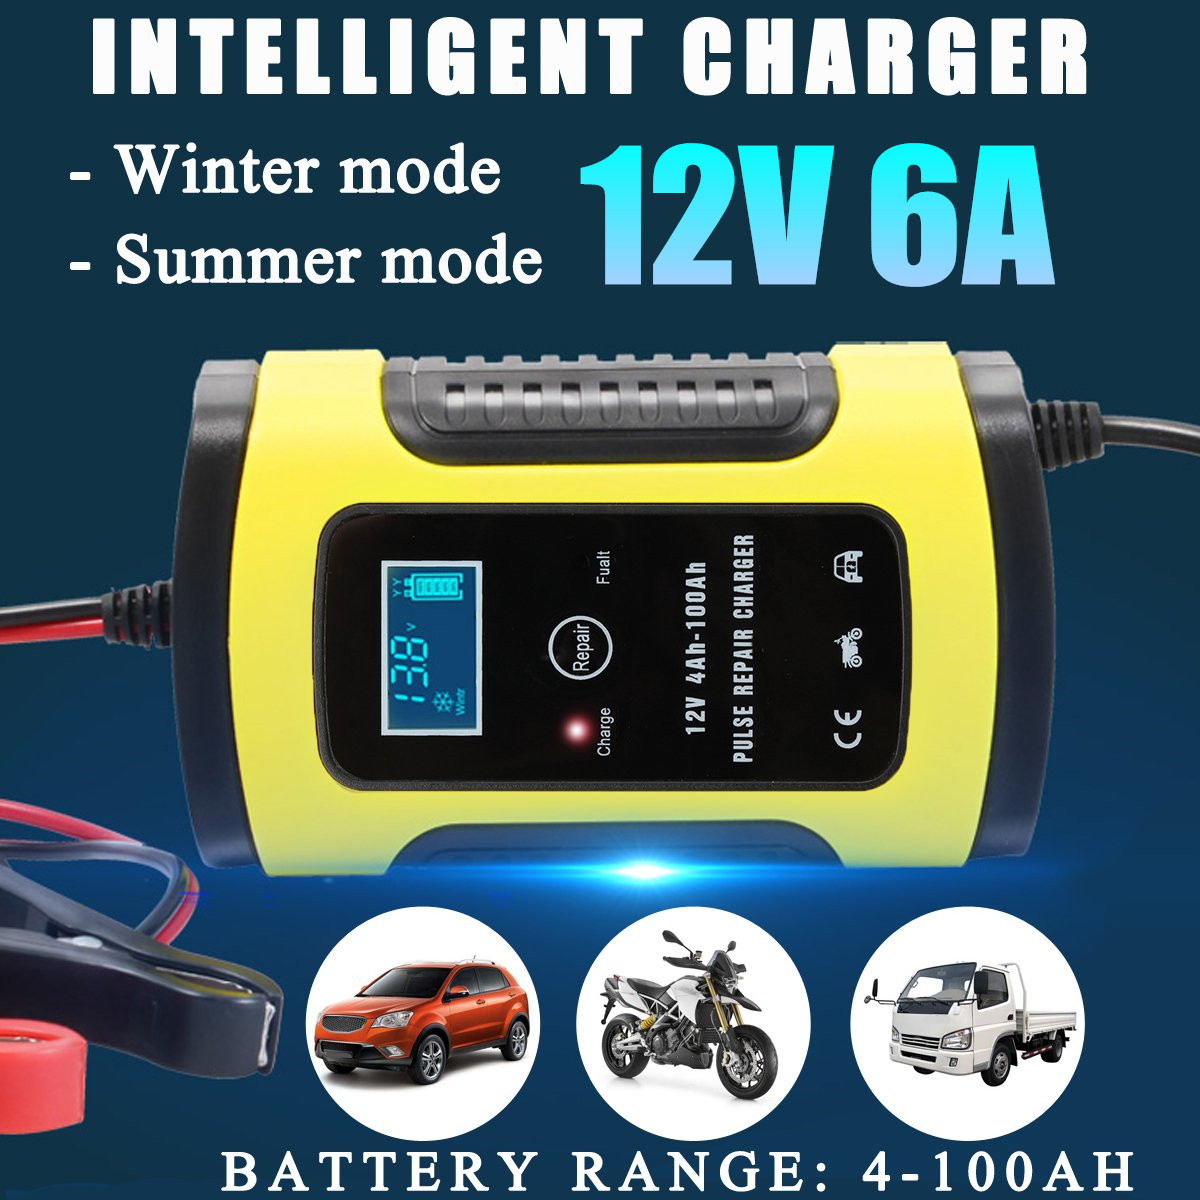 12V 6A Reparatur LCD Batterie Ladegerät Smart Schnelles Für Auto Motorrad Reparatur Typ Blei-säure-batterie Agm Gel Nass batterien Lade